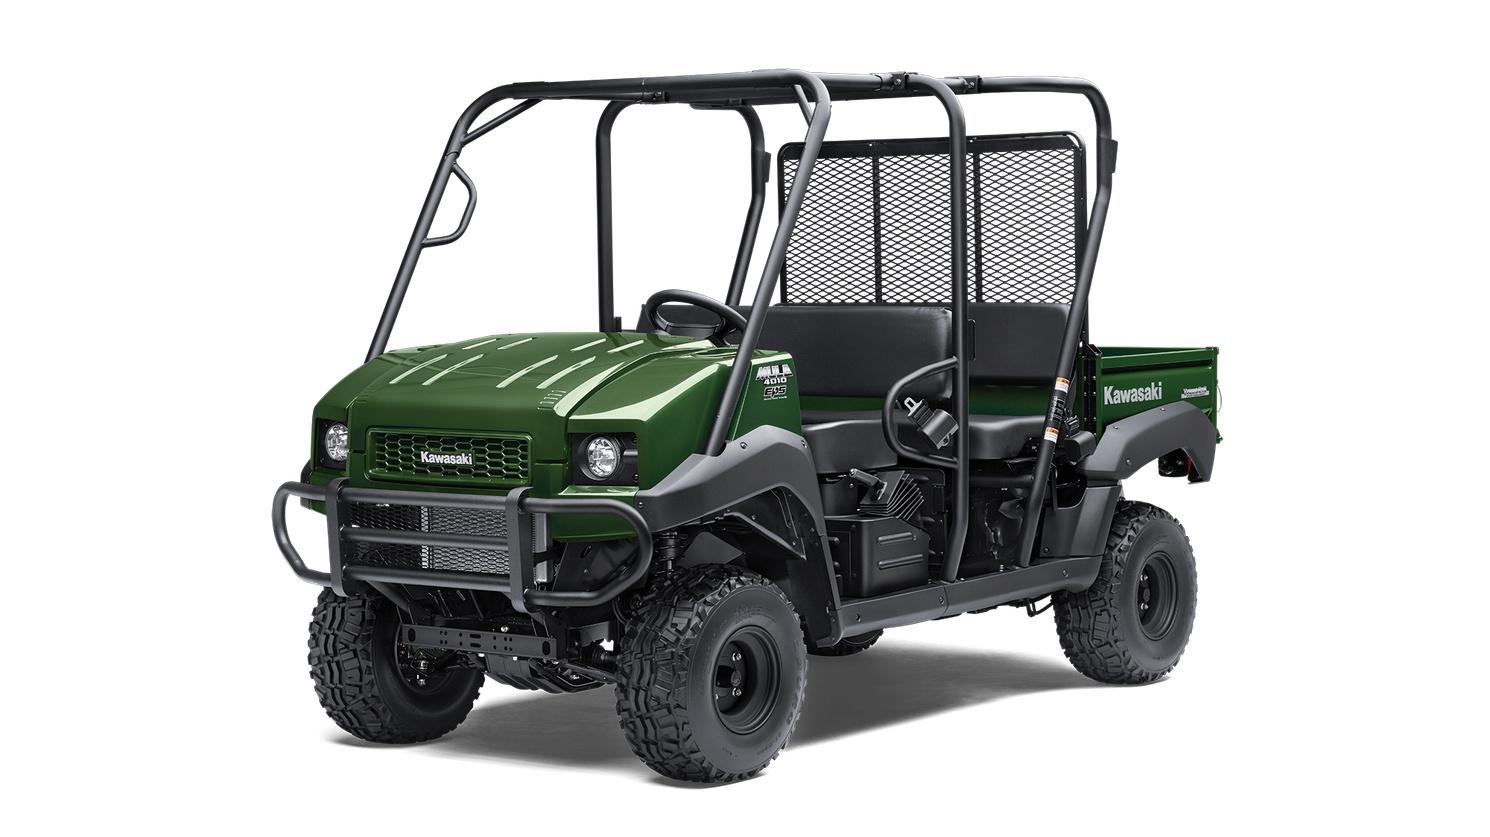 Kawasaki MULE 4010 TRANS 4x4 Vert Sommet 2020